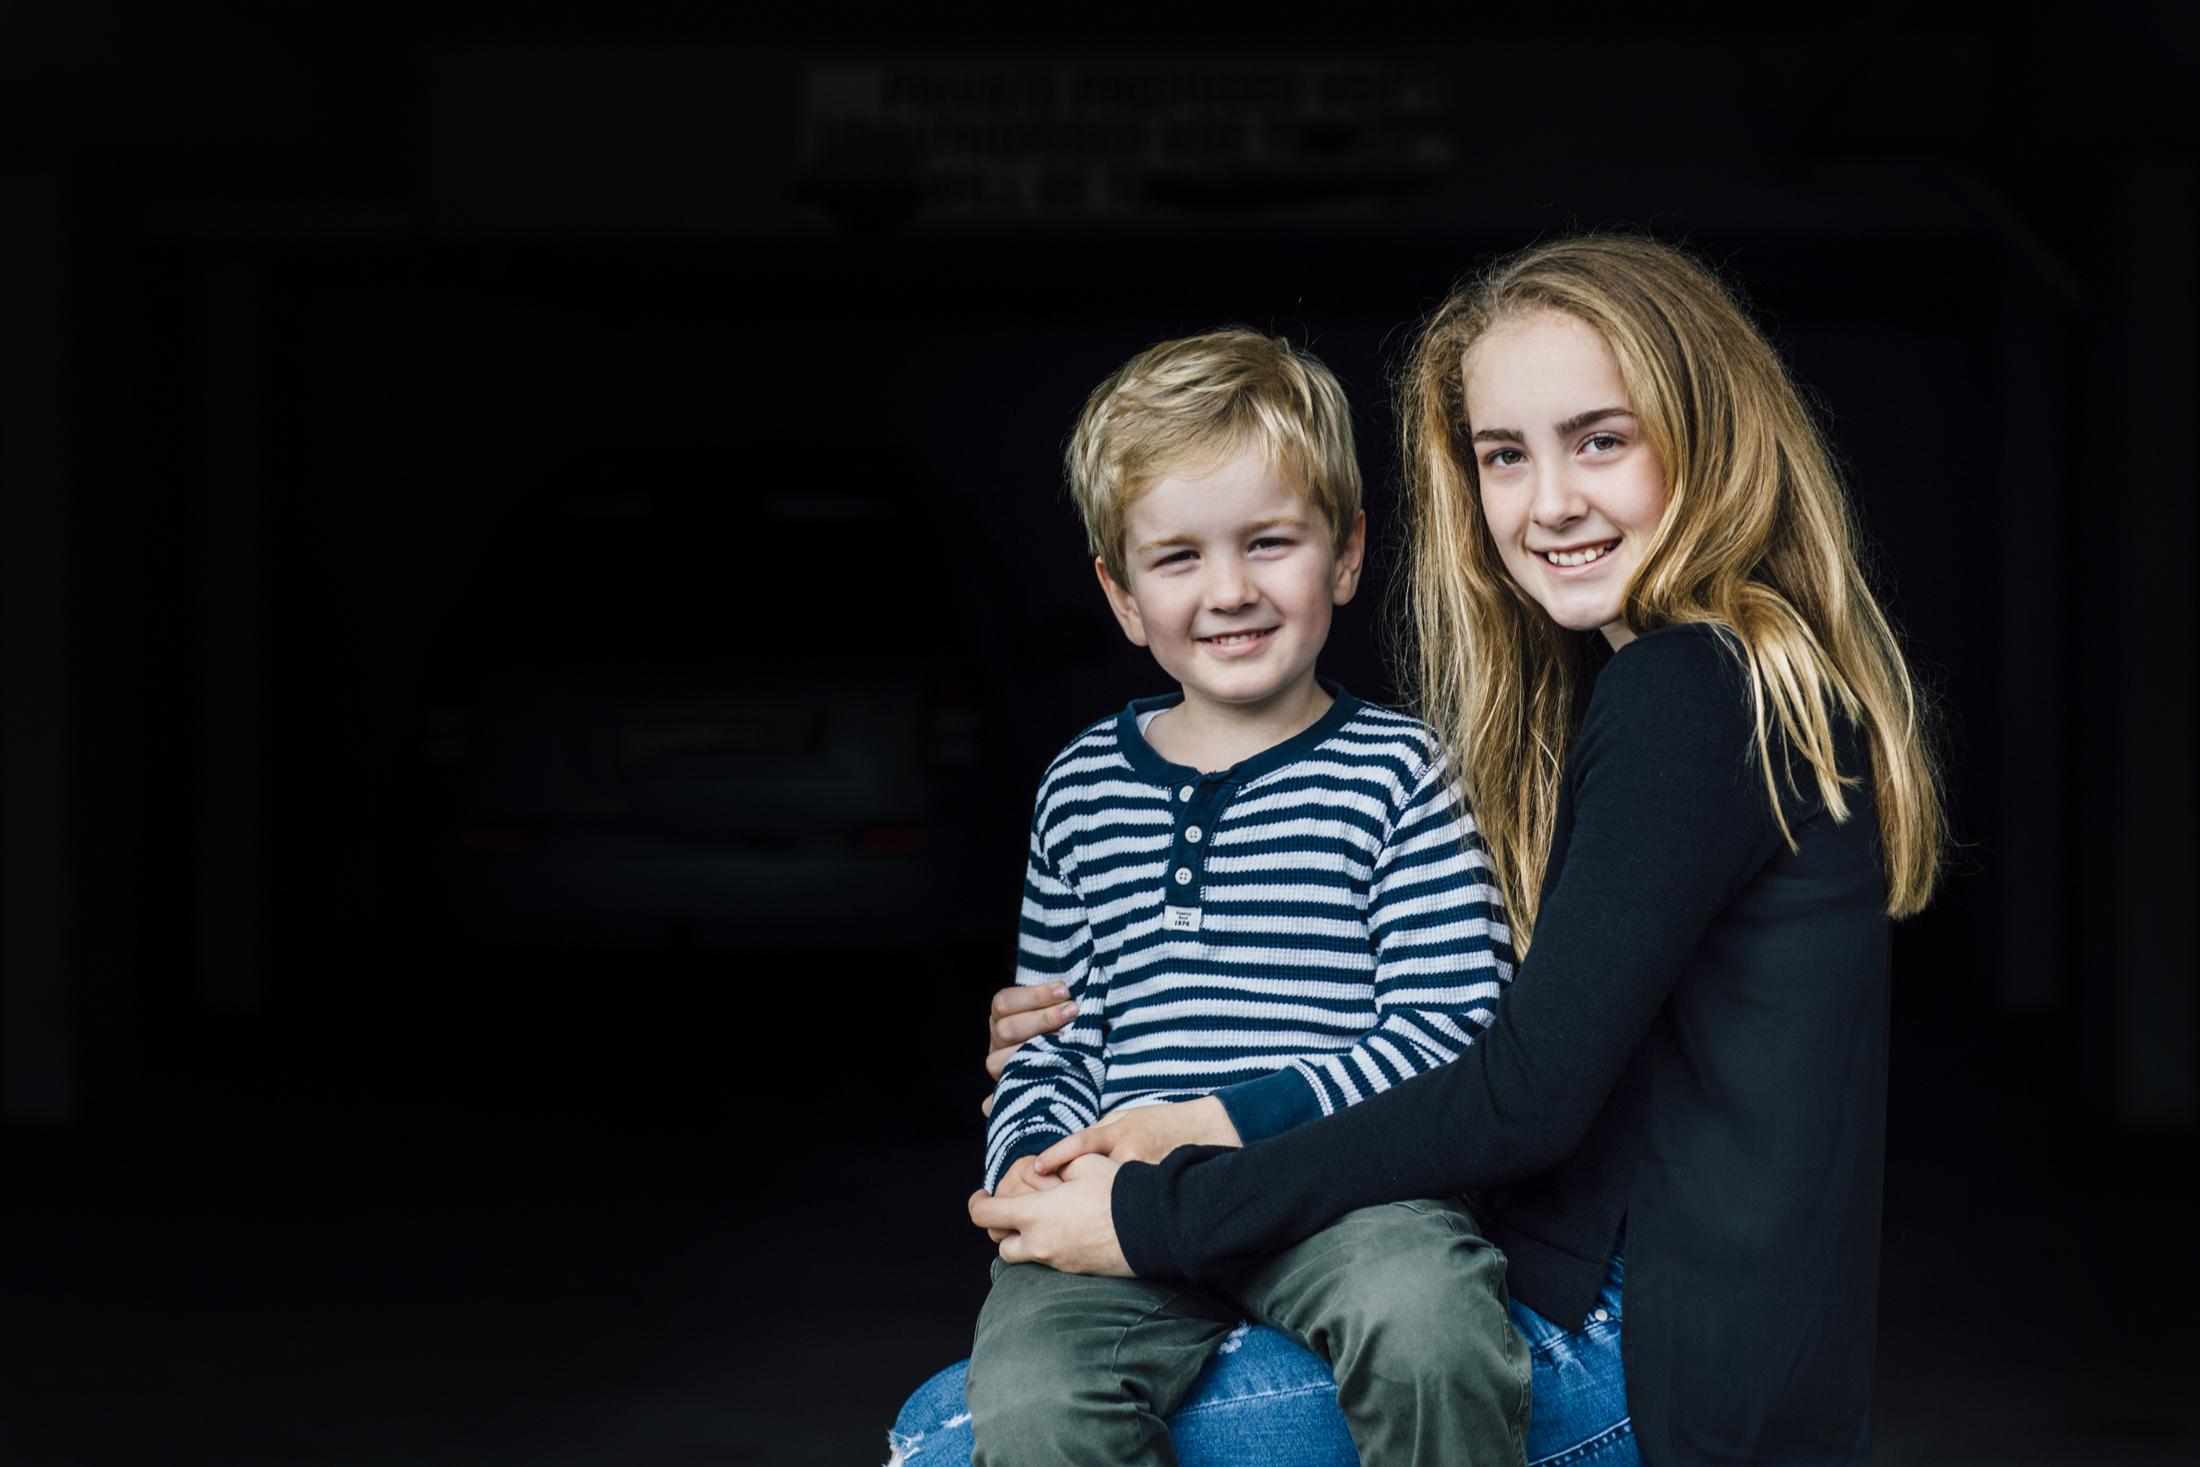 mark_taylor_sydney_family_photography_morffew-17.jpg